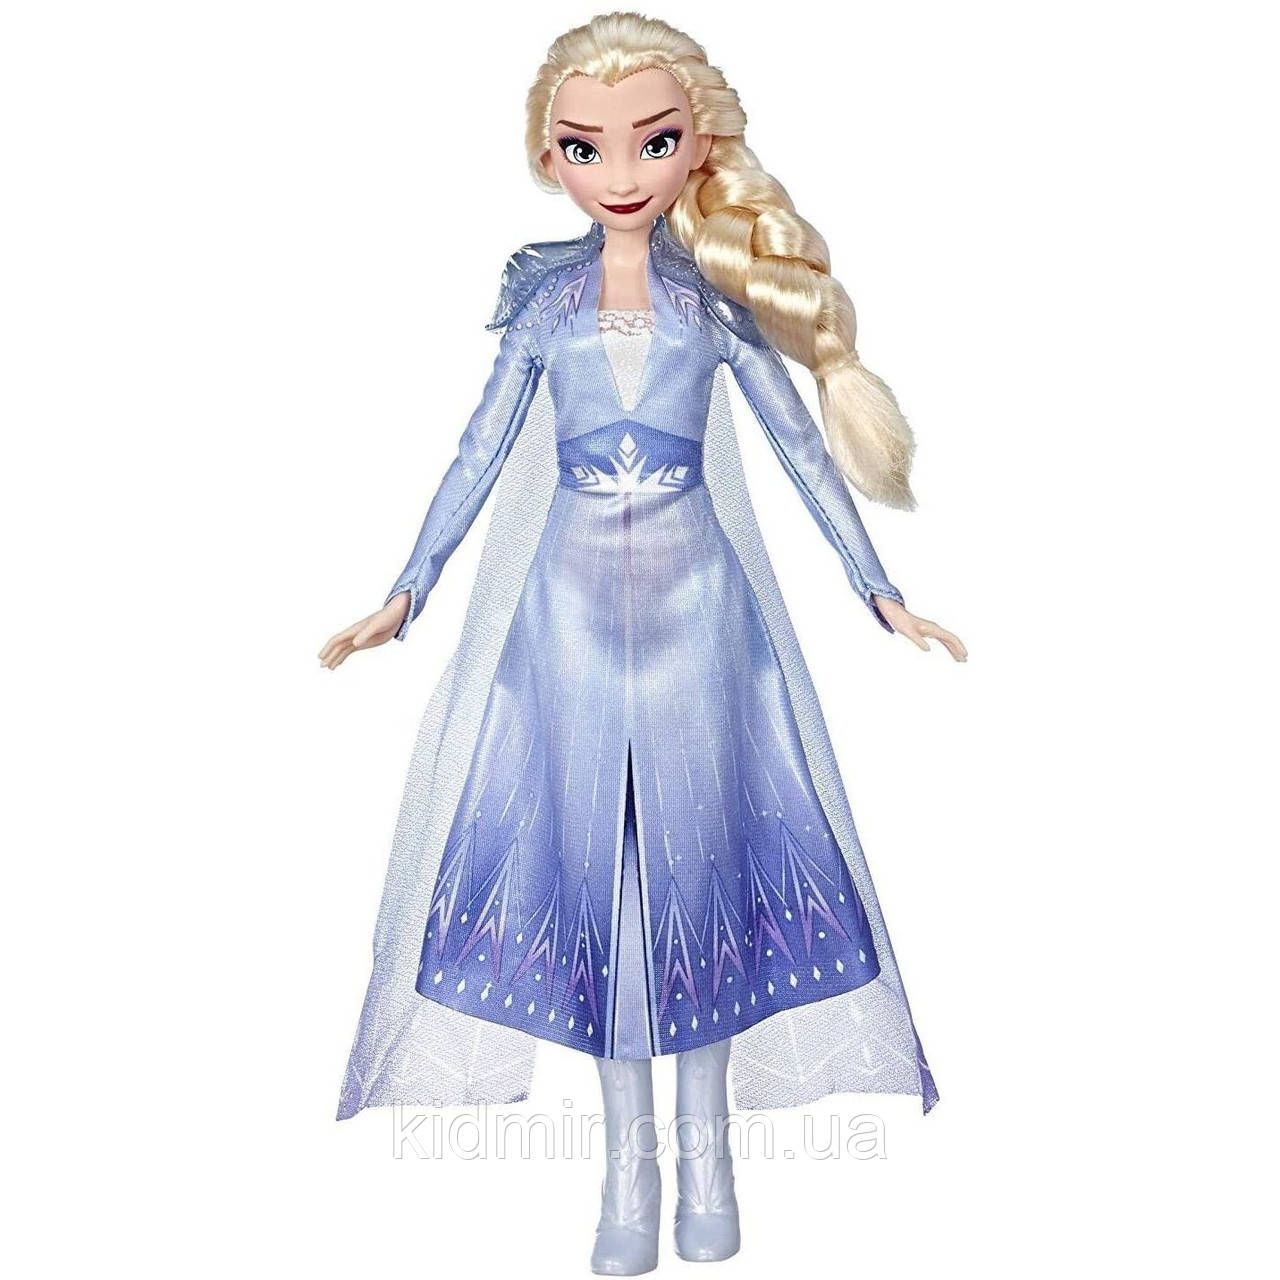 Лялька Ельза Disney Princess Холодне серце 2 Hasbro E6709